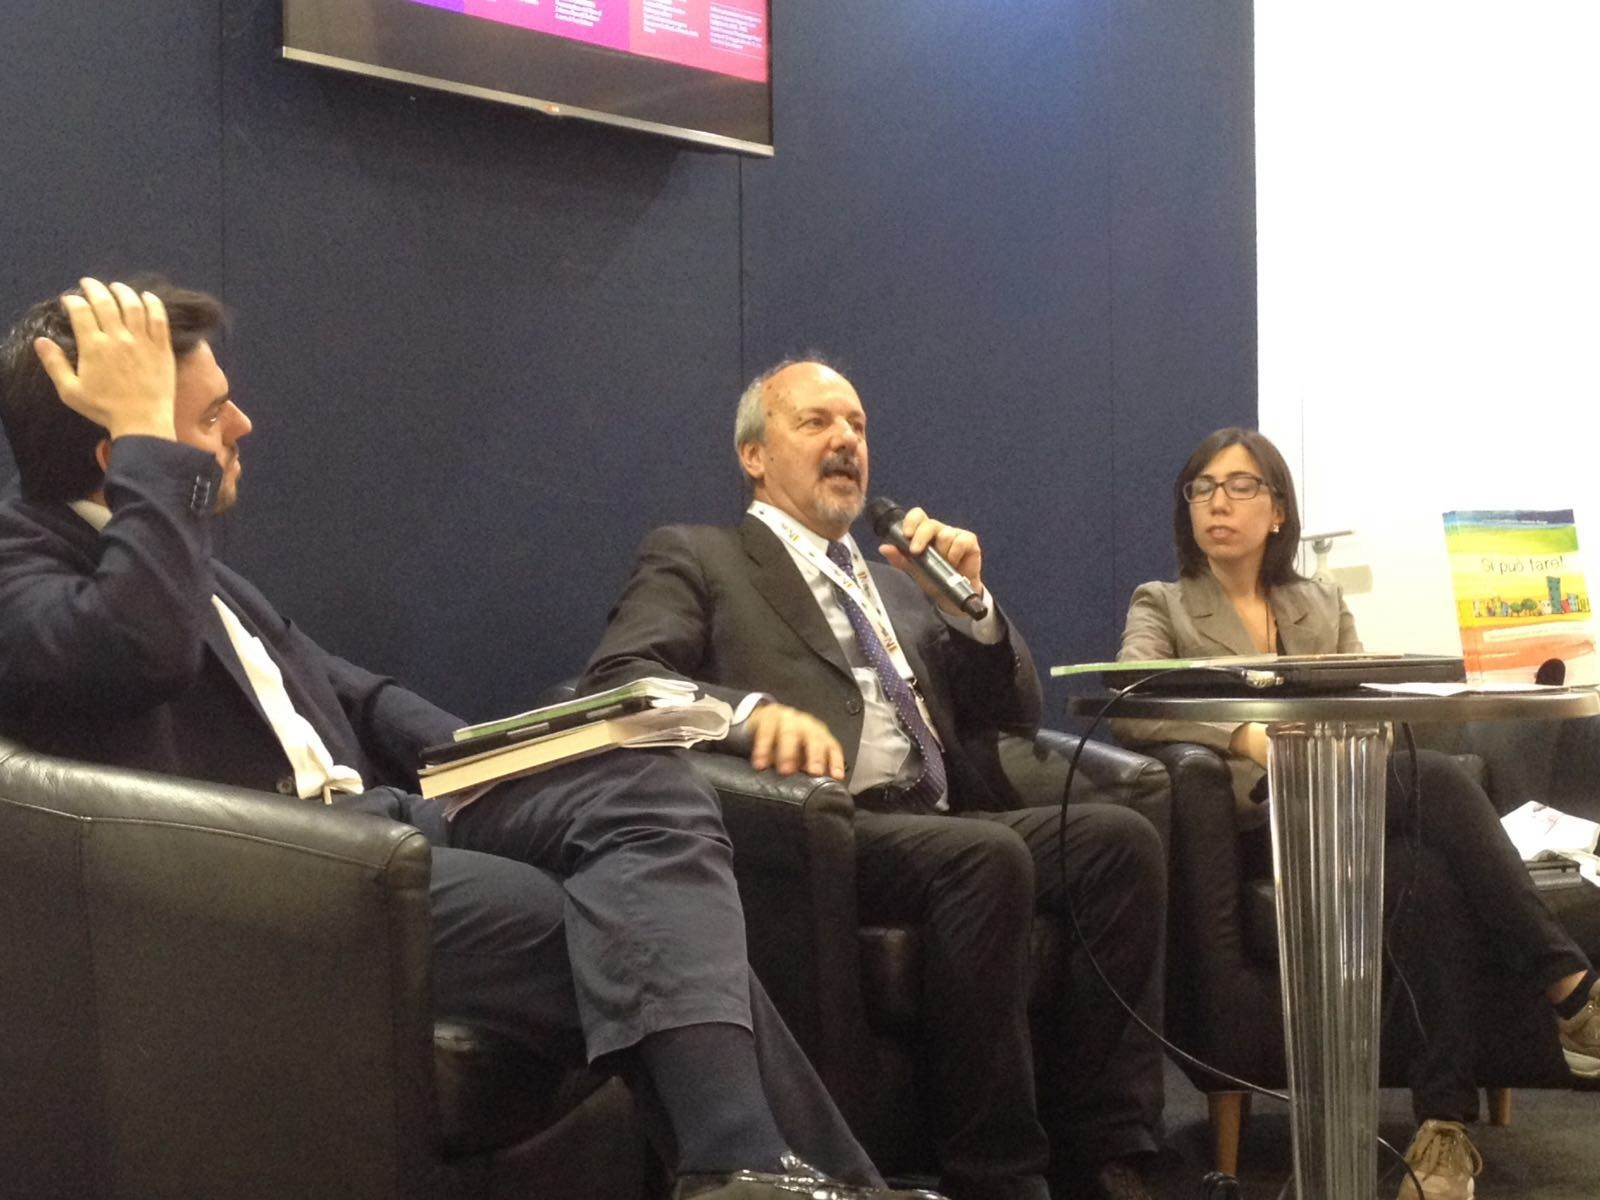 Umberto Ronga, Fabio Zavattaro e Luisa Alfarano